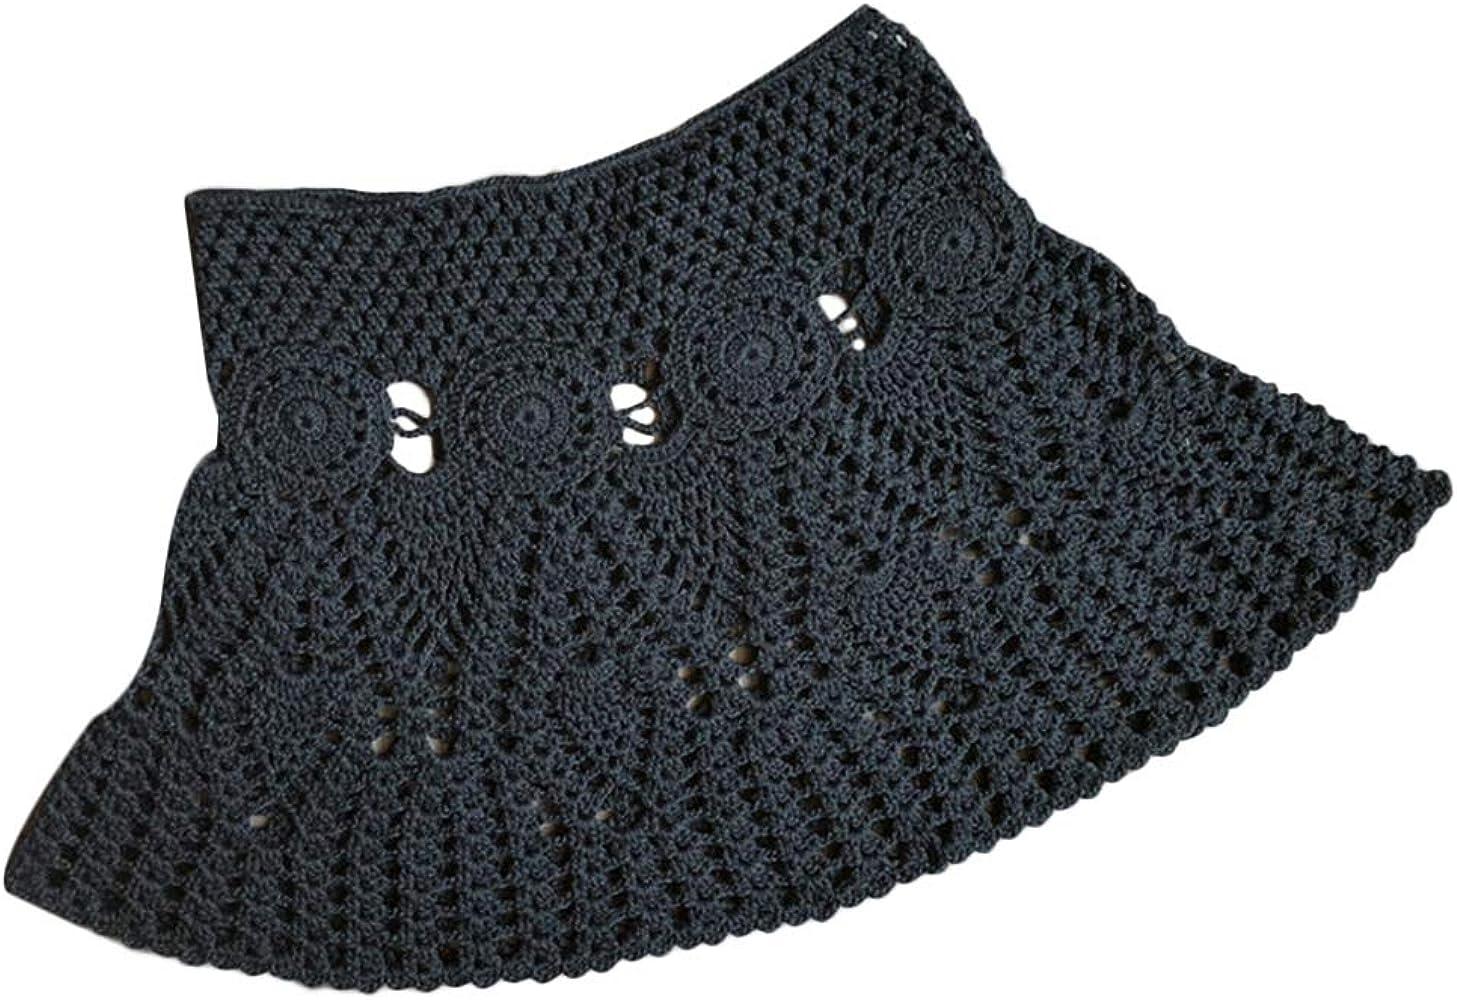 Black mini skirts size 28 Lovnely Women S Knitted Crochet Beach Mini Skirt Bikini Swimsuit Cover Ups Beachwear Skirts One Size Black At Amazon Women S Clothing Store